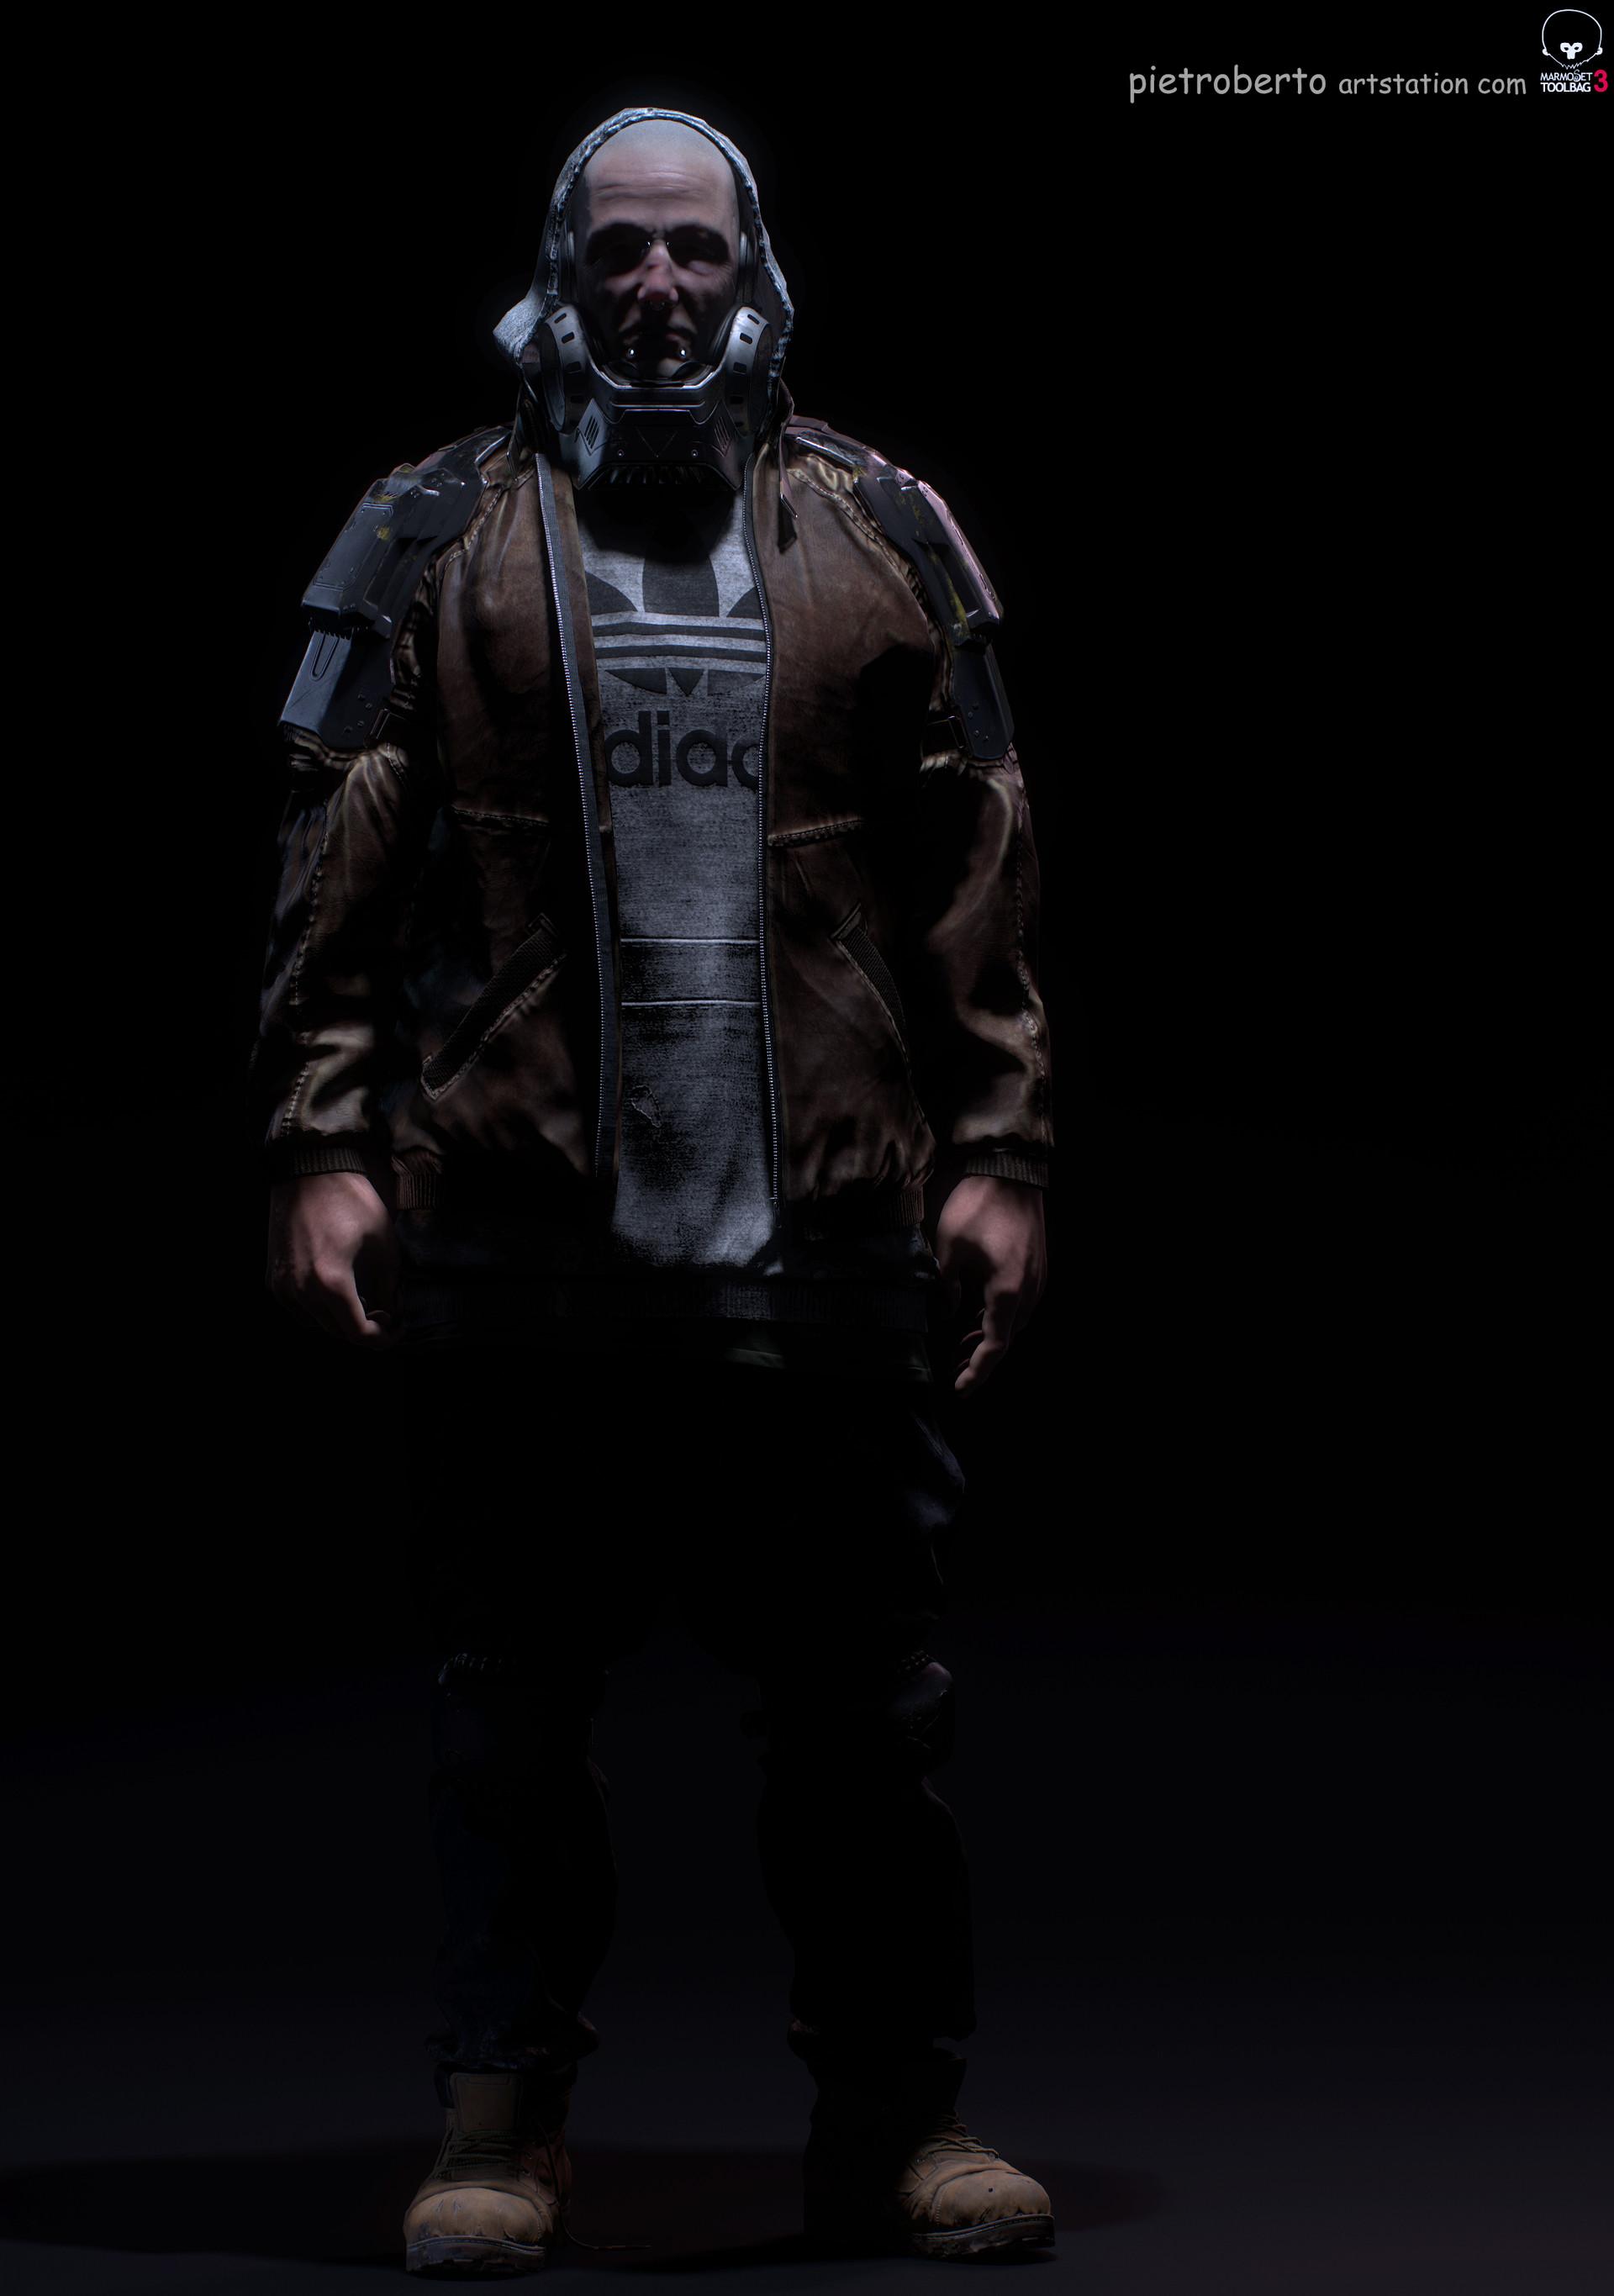 Pietro berto dark